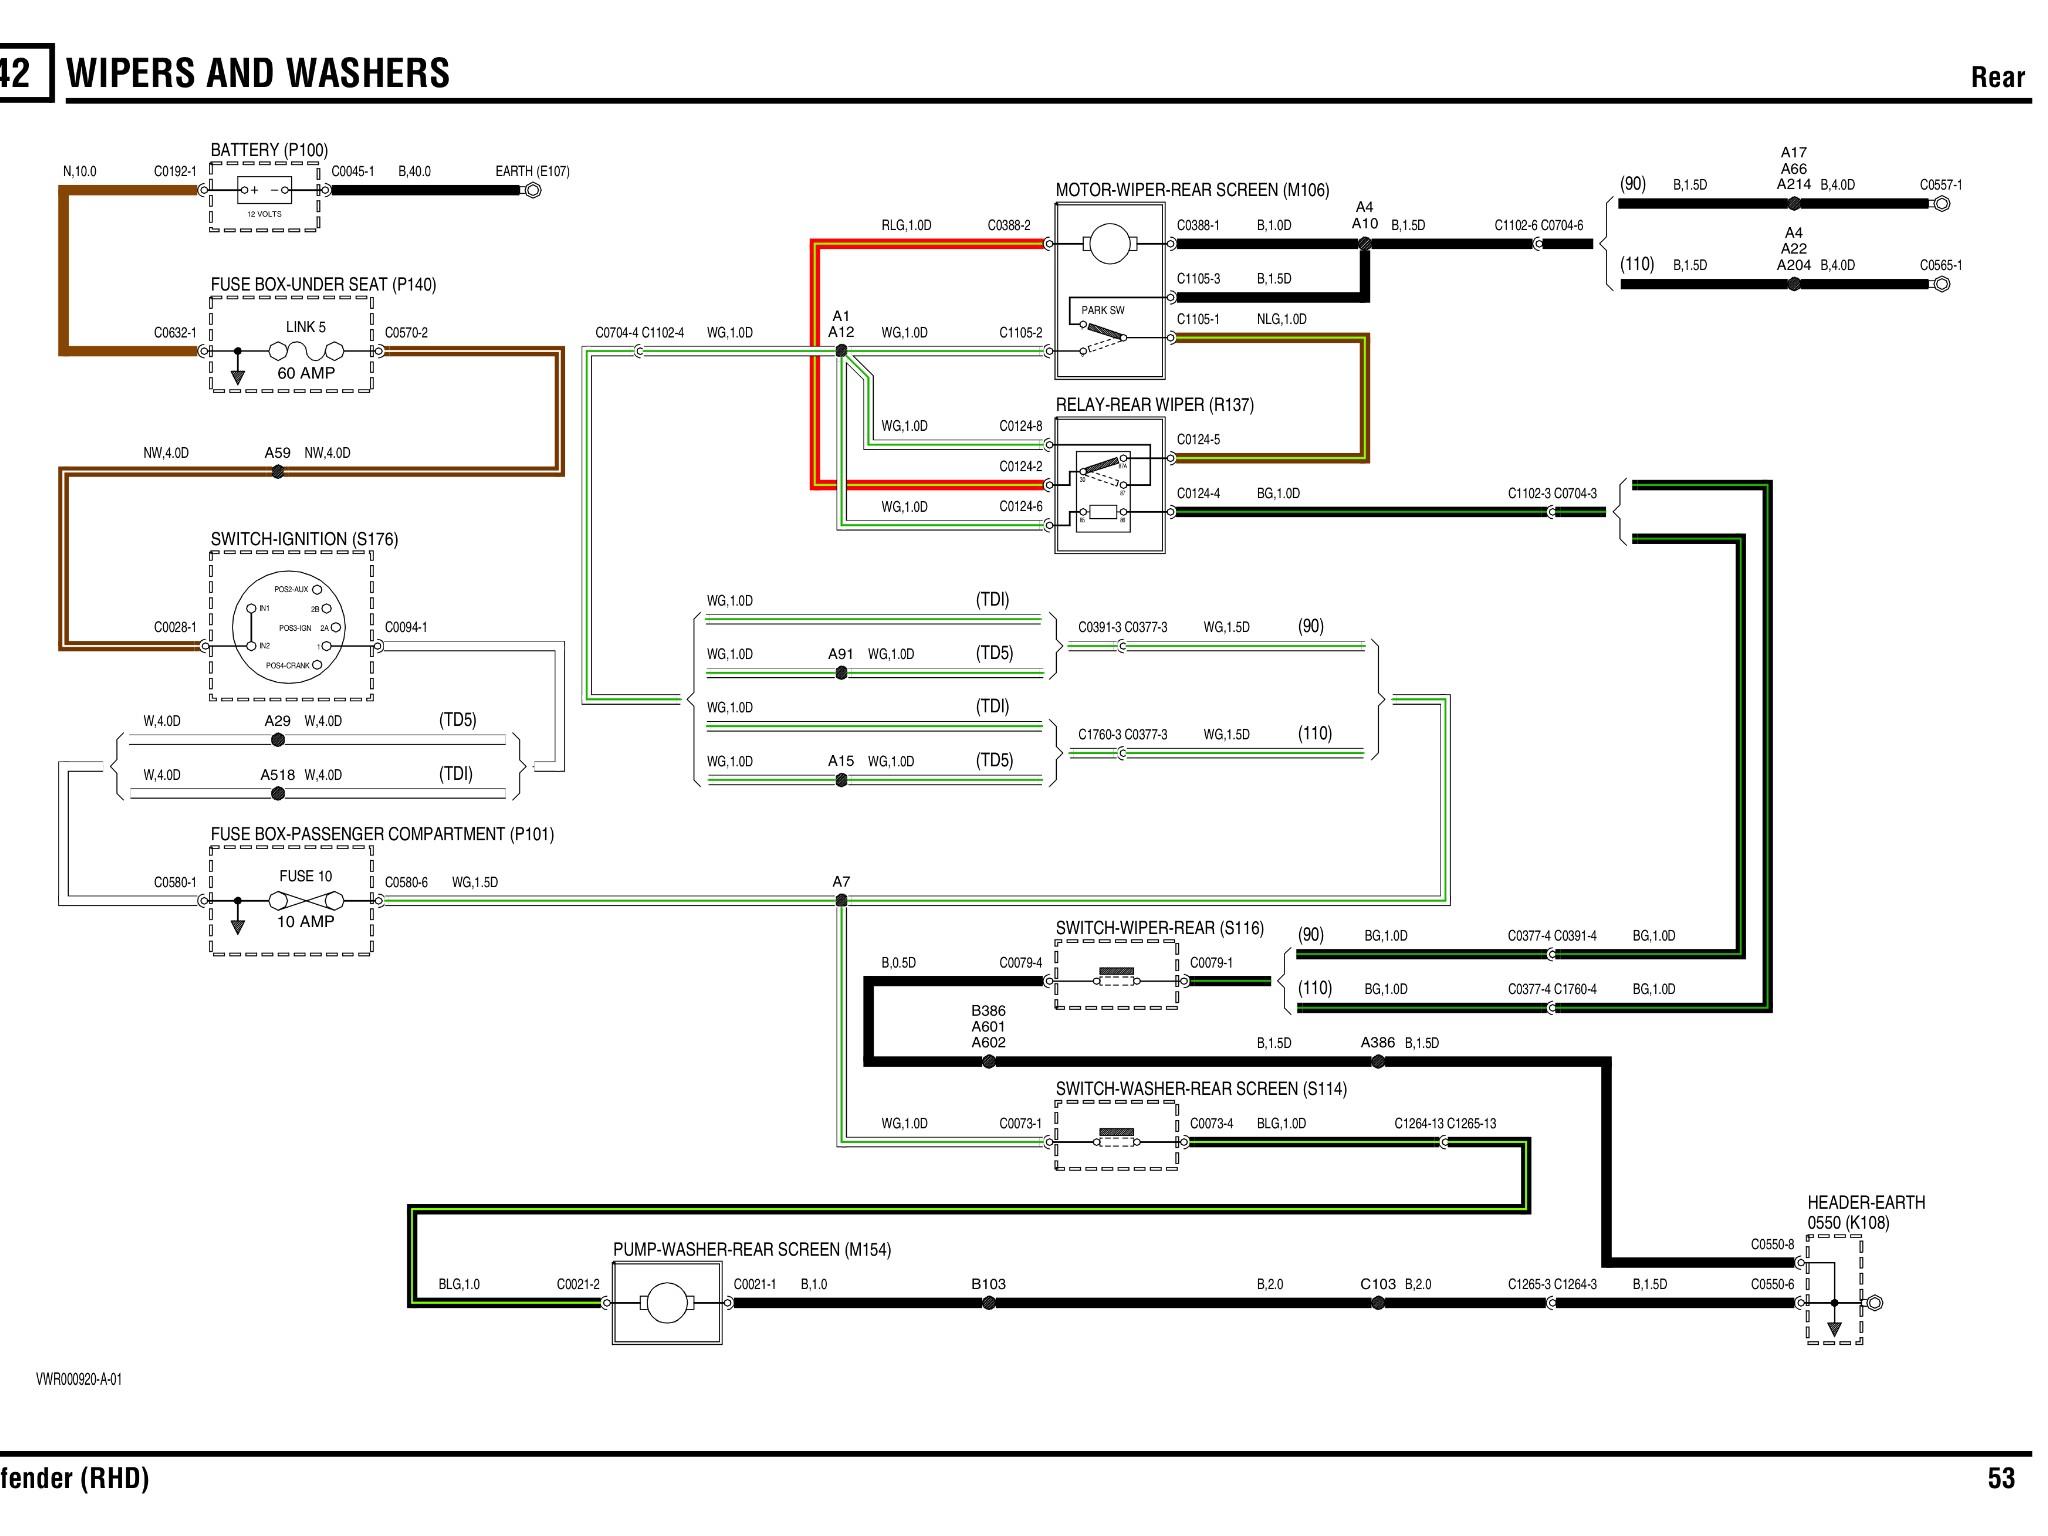 Jumper Cables Diagram Td5 Rear Wiper Wiring Help Please Defender forum Lr4x4 the Of Jumper Cables Diagram